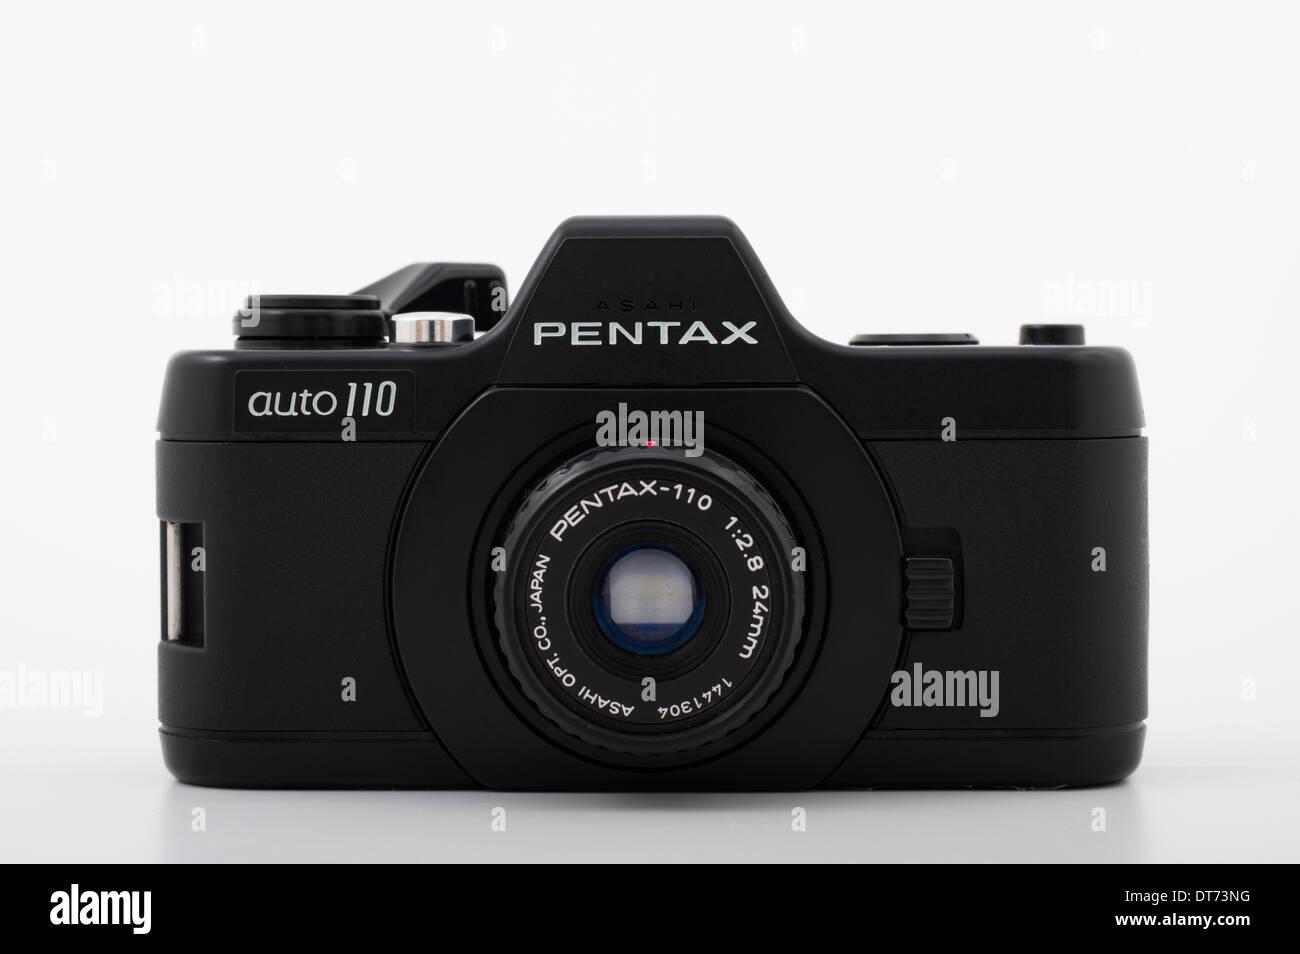 Pentax Auto 110 Film SLR-Kamera mit kompakten 110 film Stockfoto